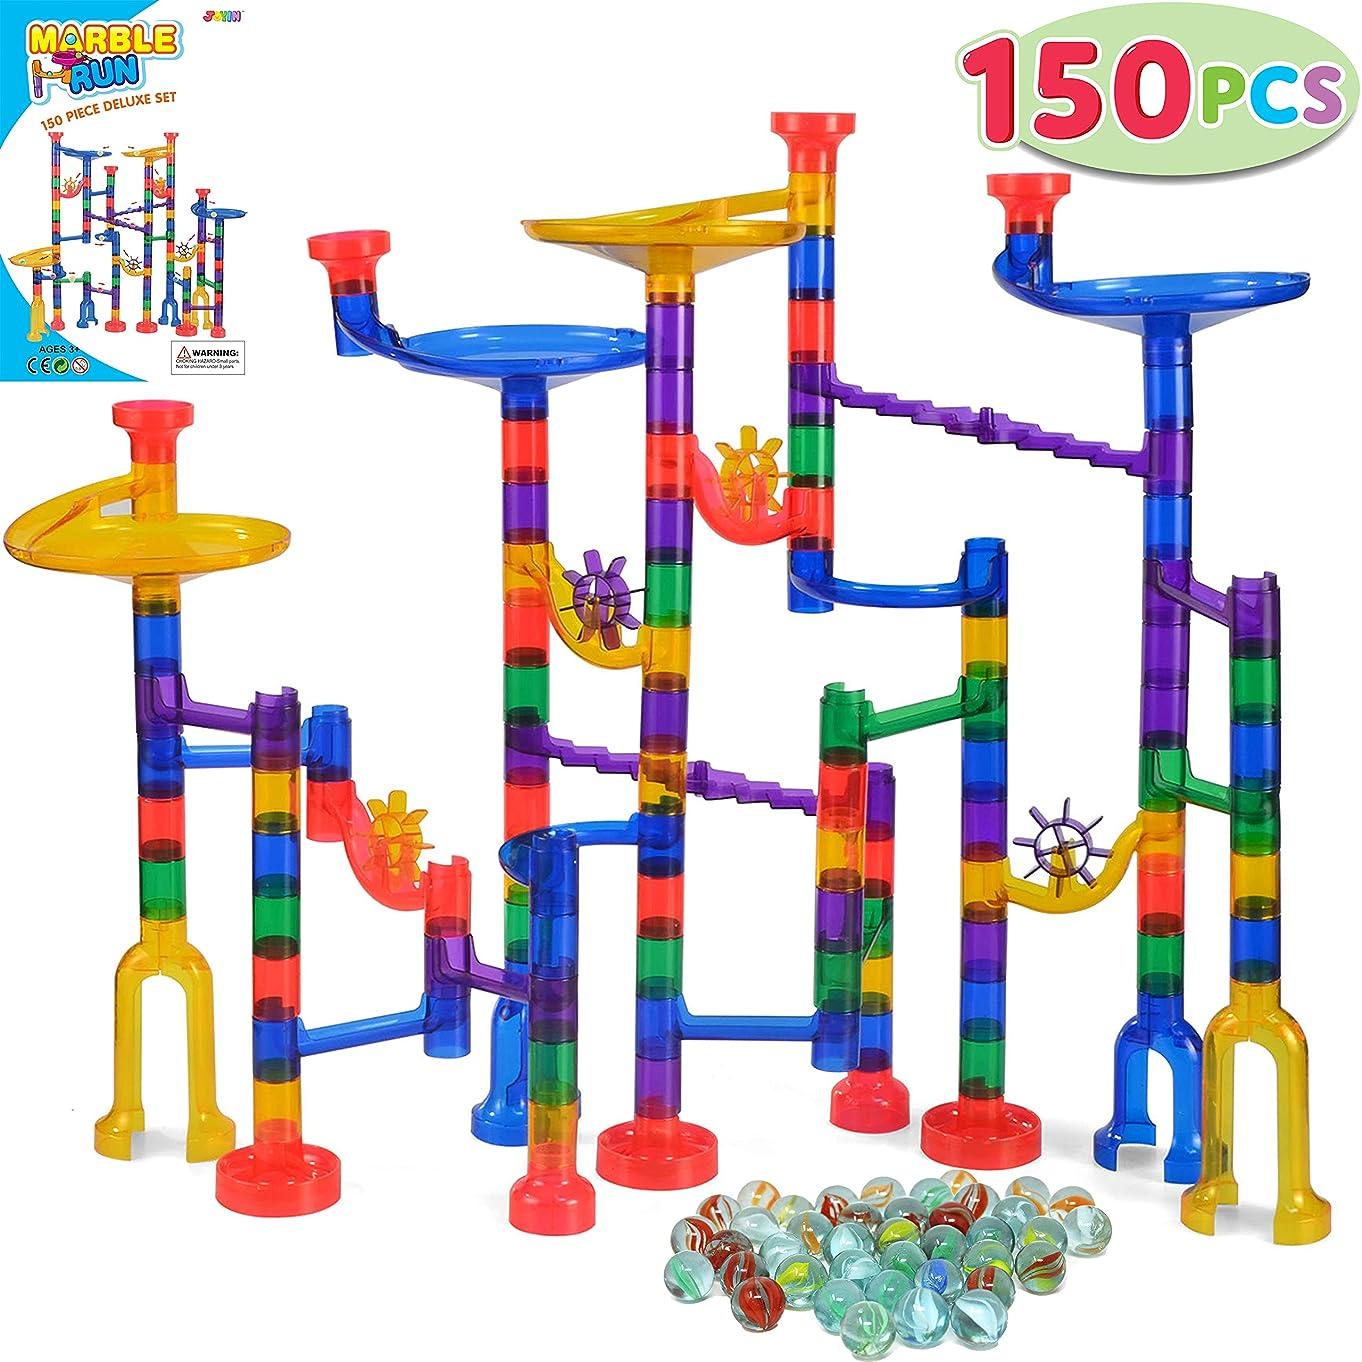 JOYIN 150 Pcs Marble Run Premium Set, Construction Building Blocks Toys, STEM Learning Toy, Educational Building Block Toy(100 Translucent Plastic Pieces + 50 Glass Marbles) l22842814